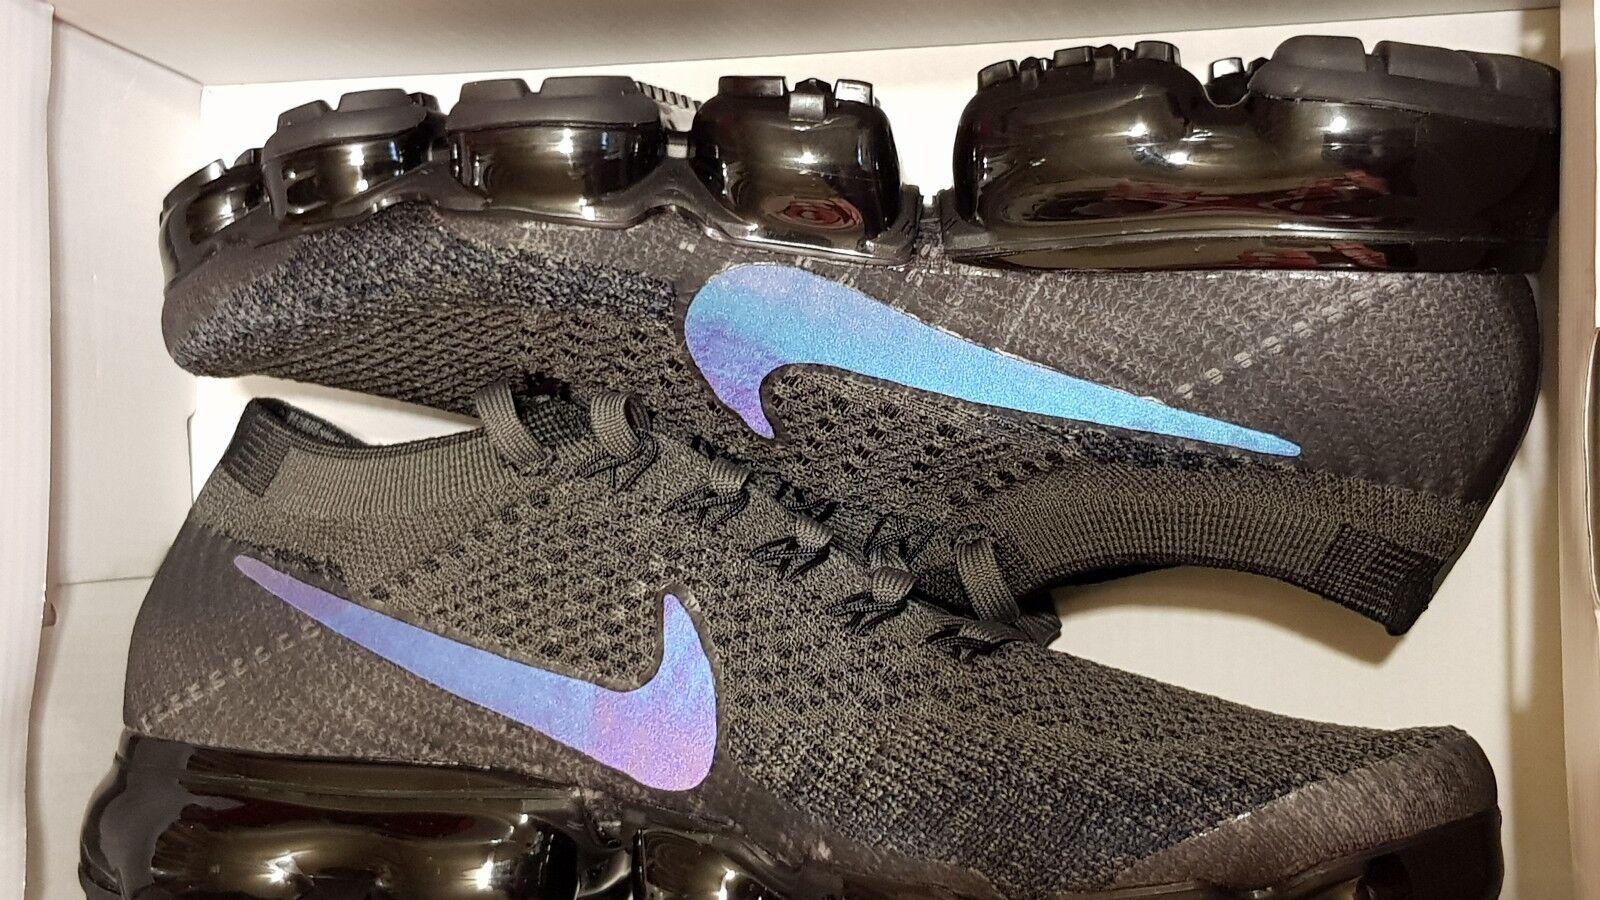 Nike Women's Air Vapormax Flyknit Midnight Fog Black 849557 009 Size 8